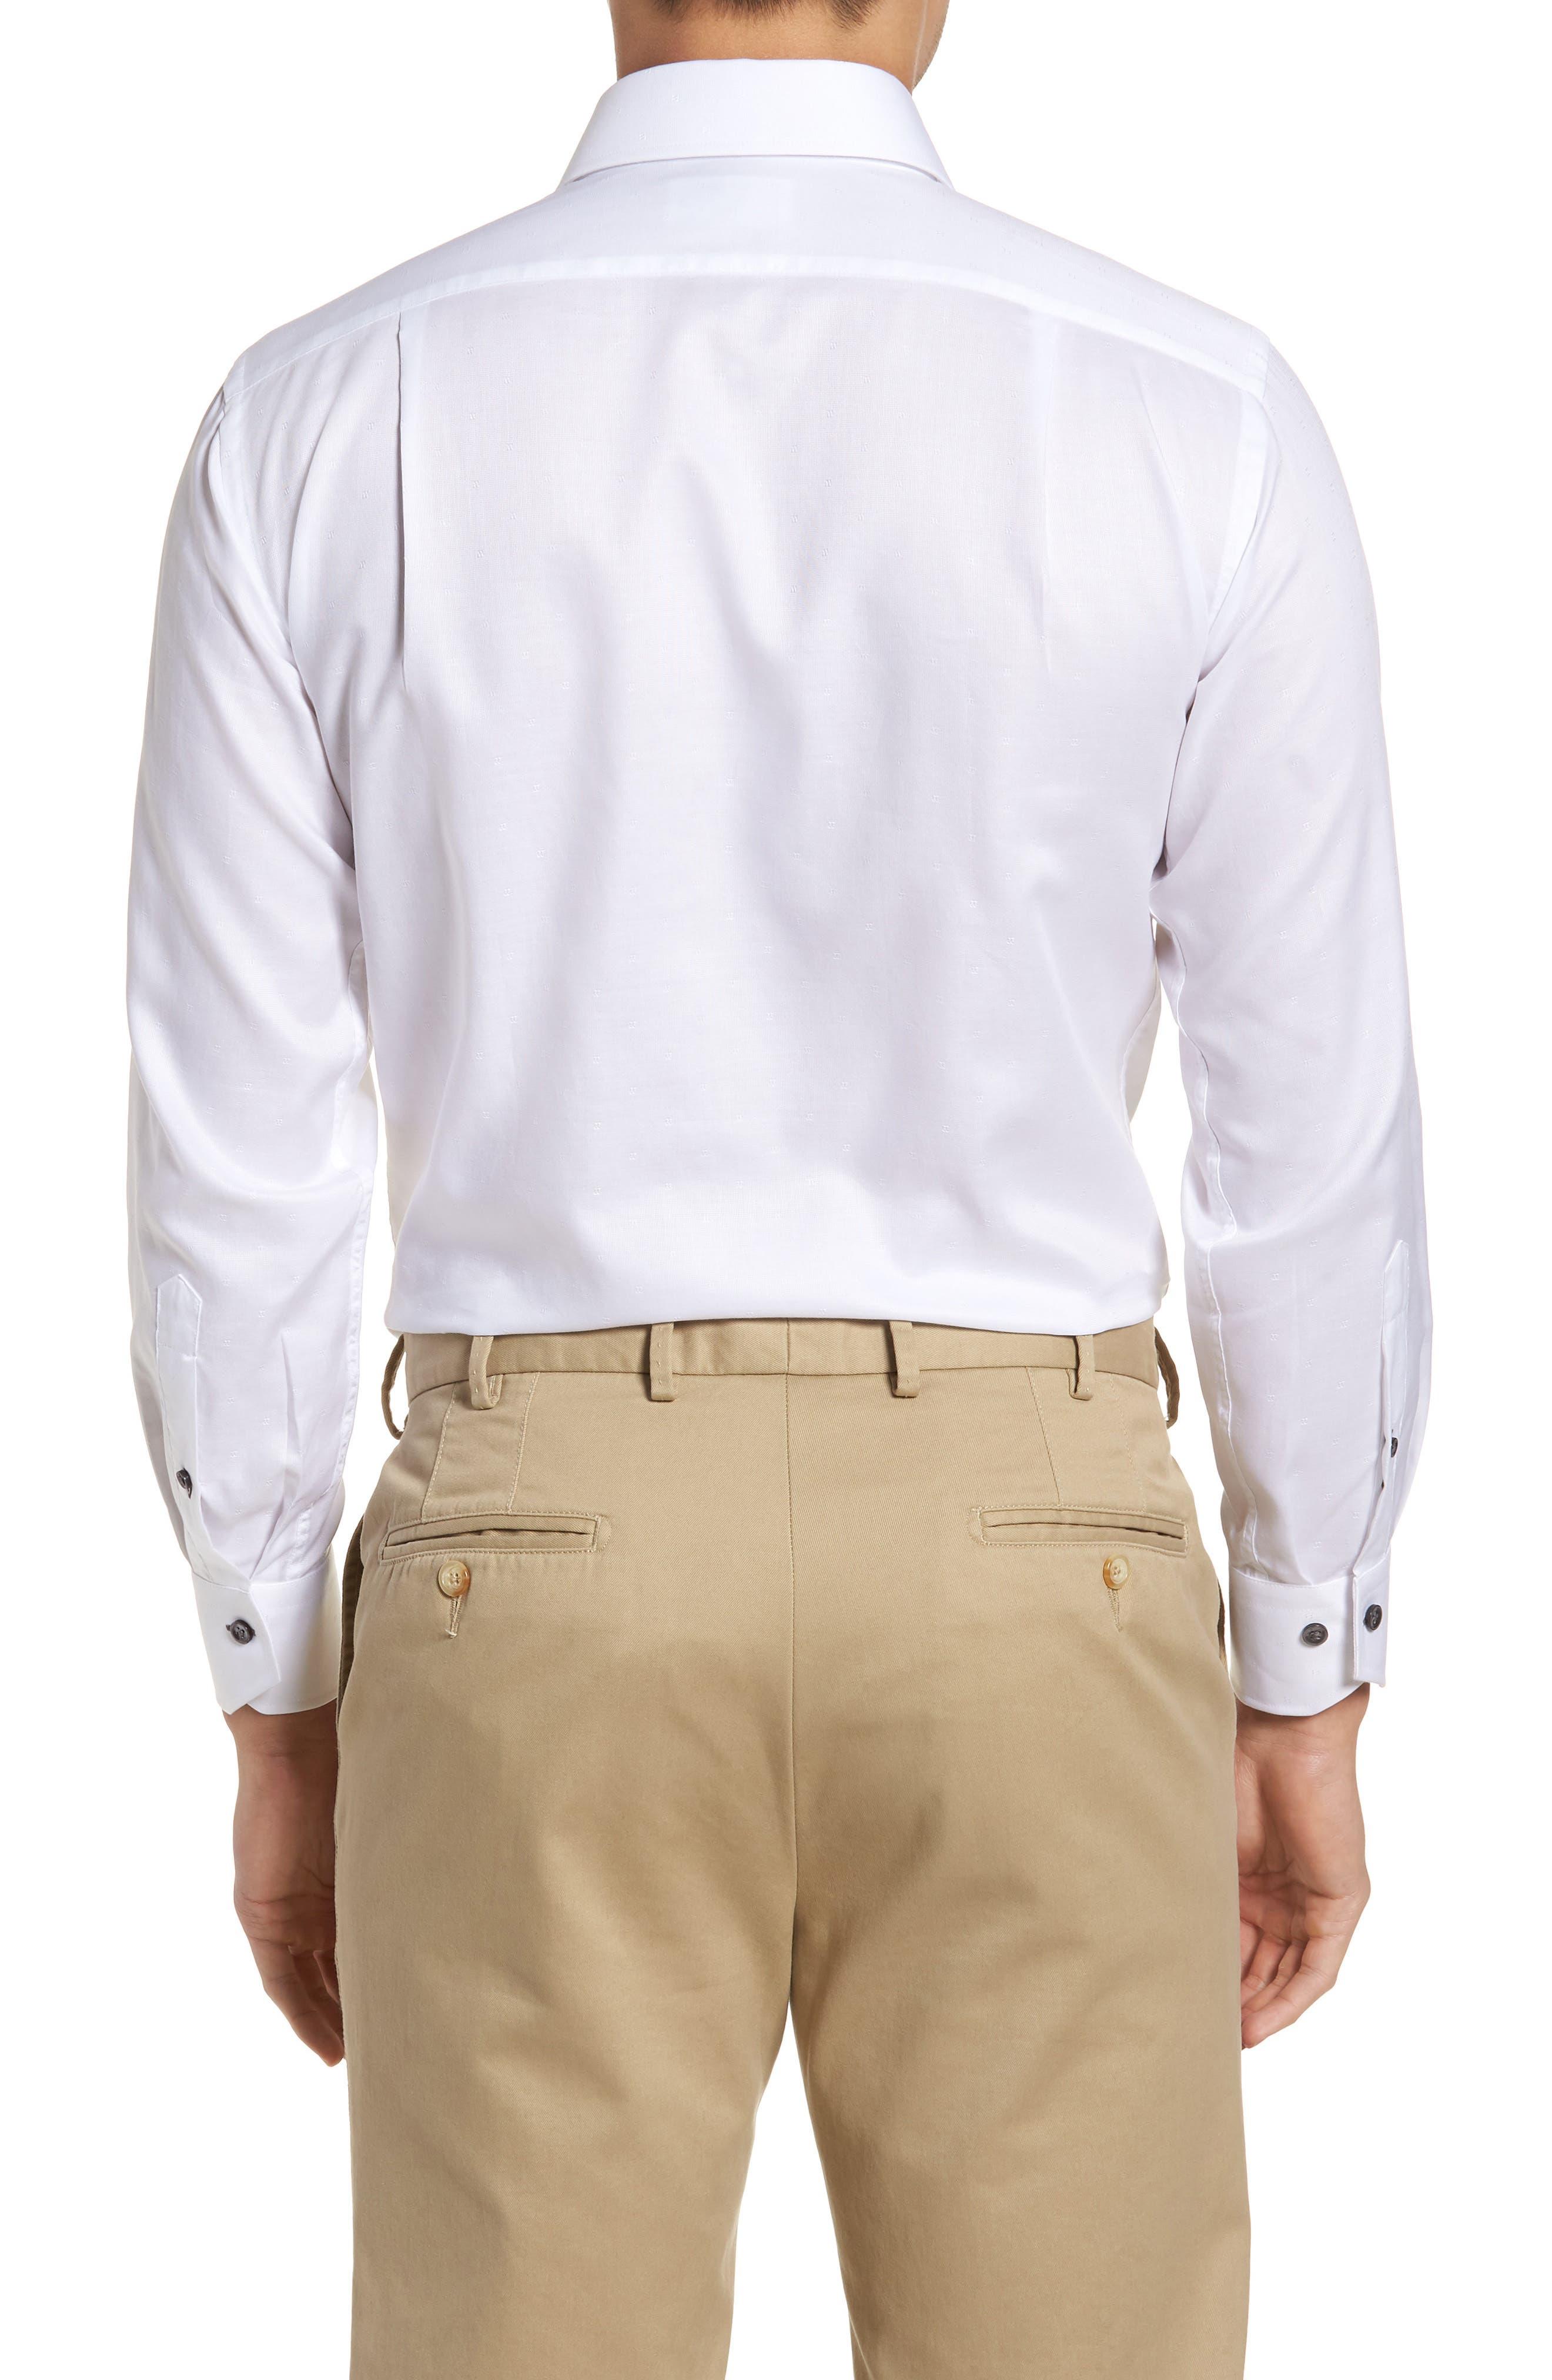 Trim Fit Textured Dress Shirt,                             Alternate thumbnail 3, color,                             White